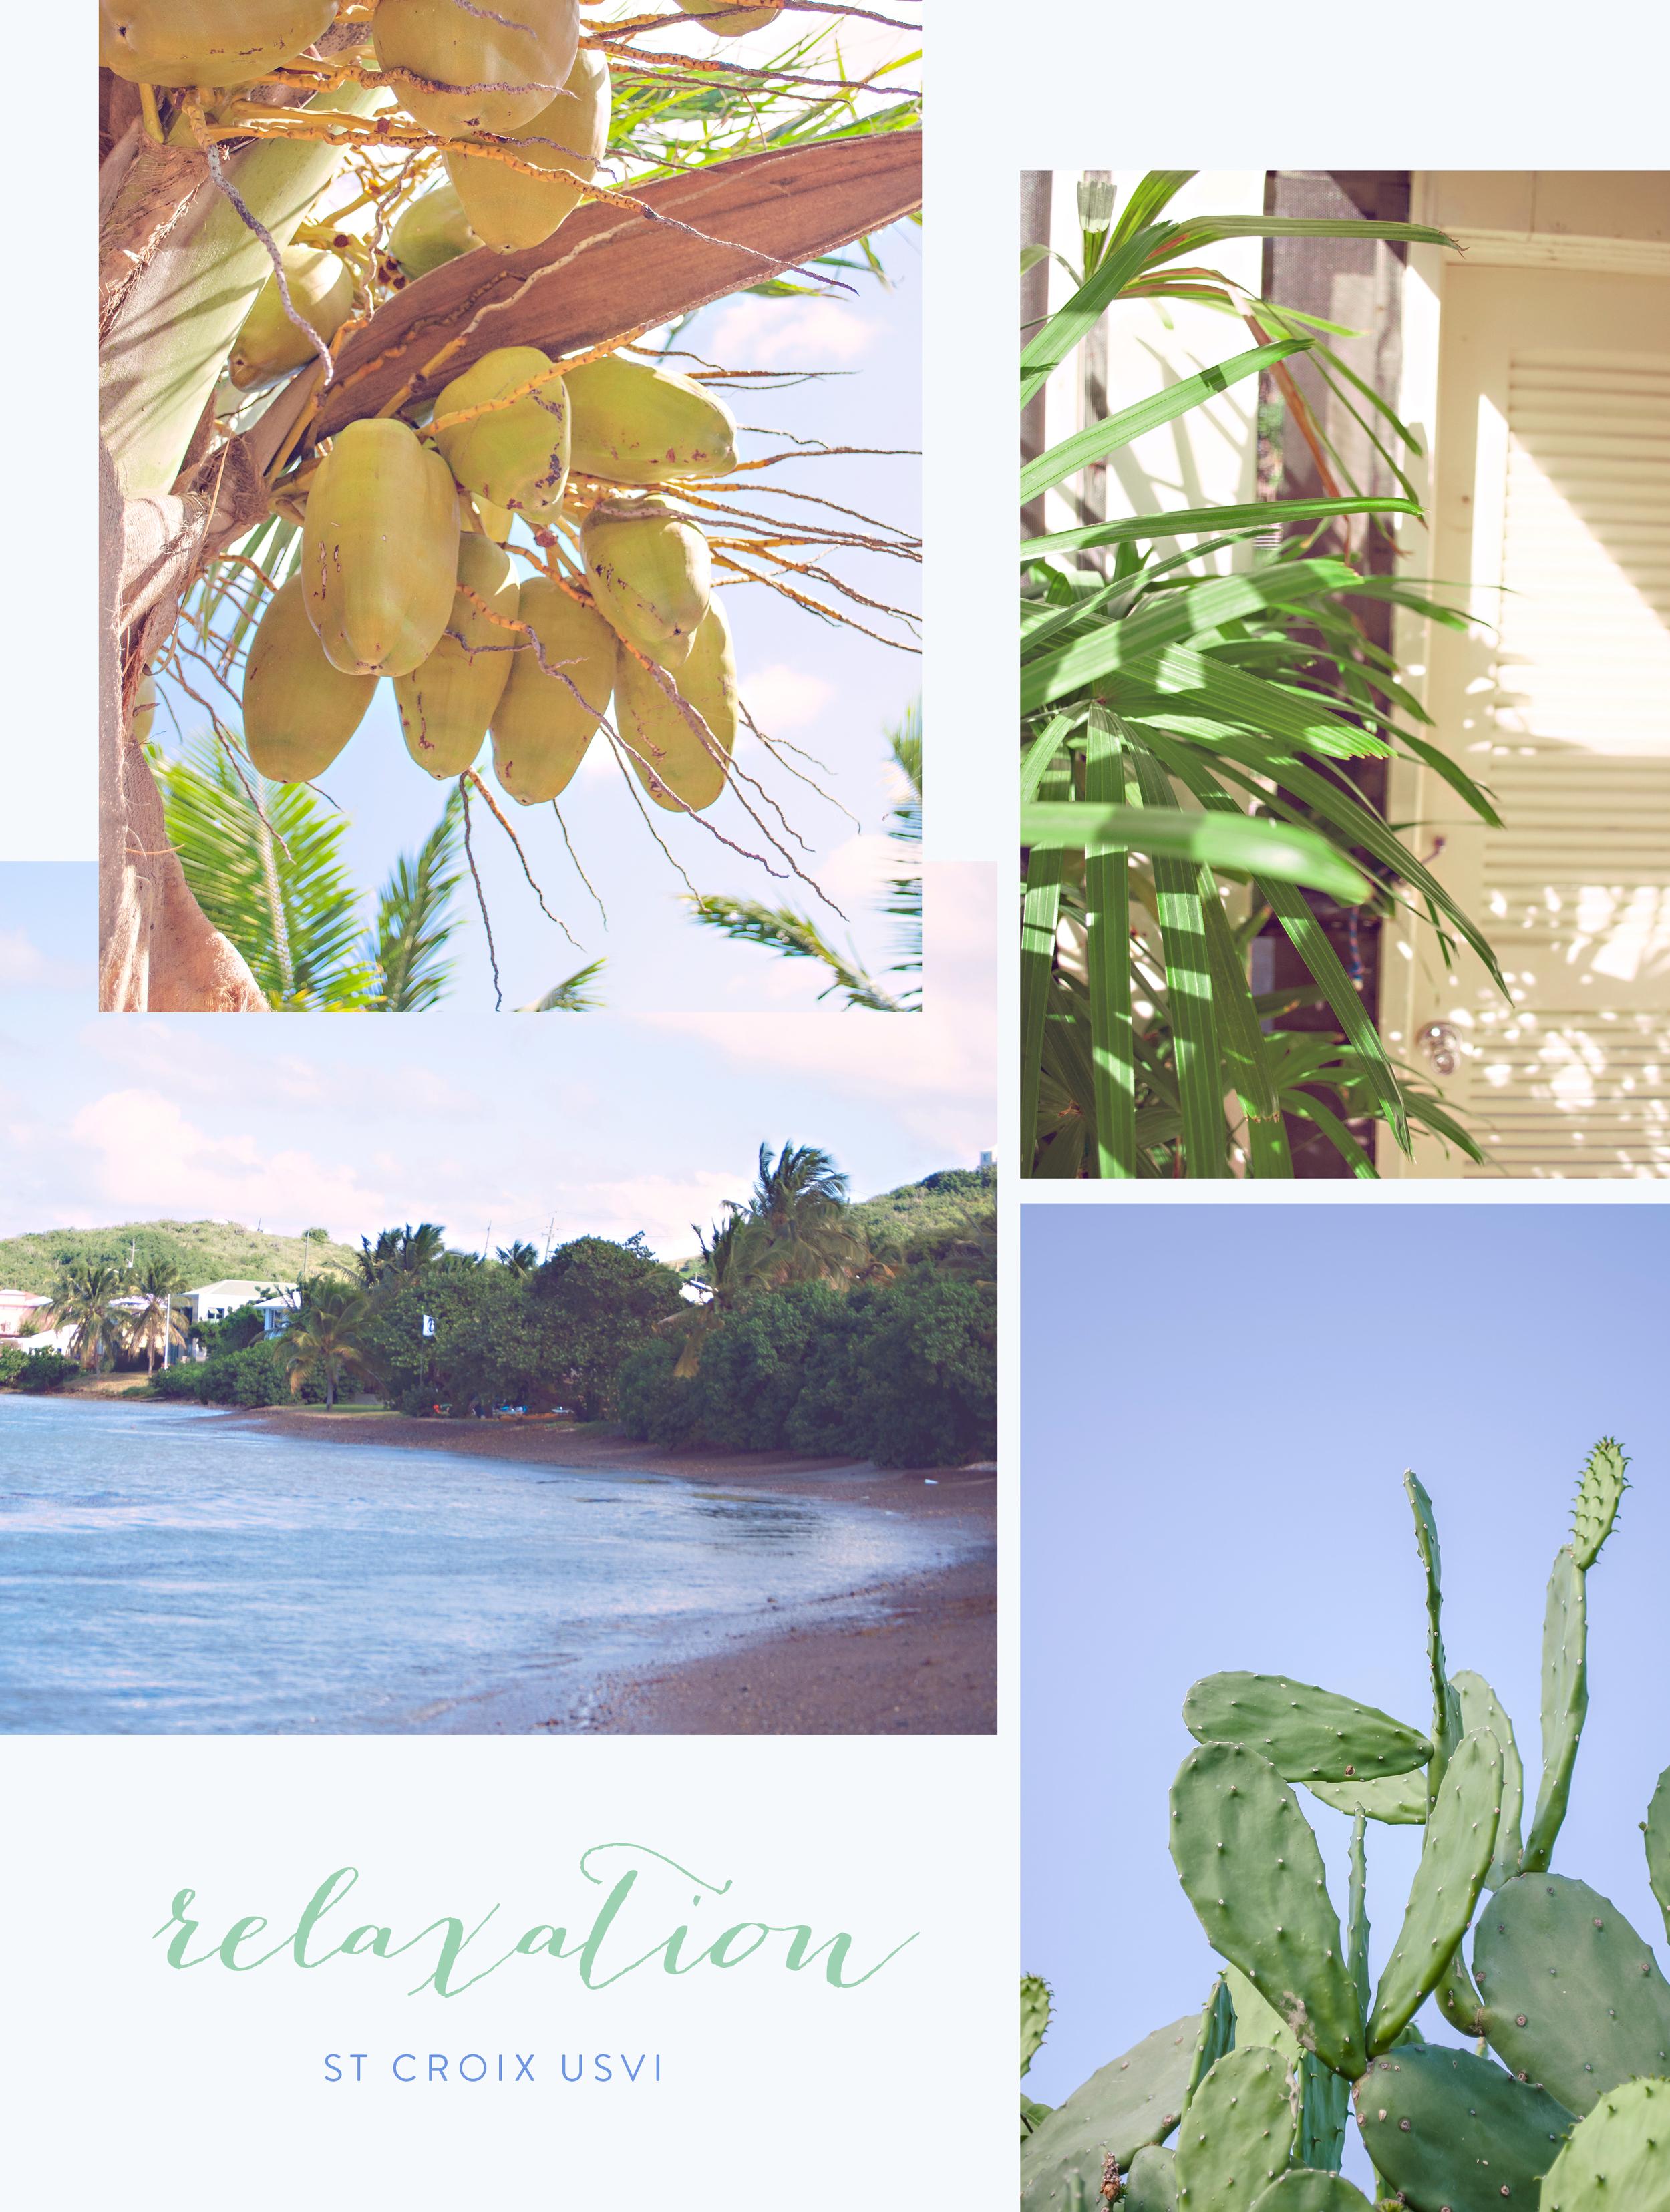 St Croix USVI Vacation